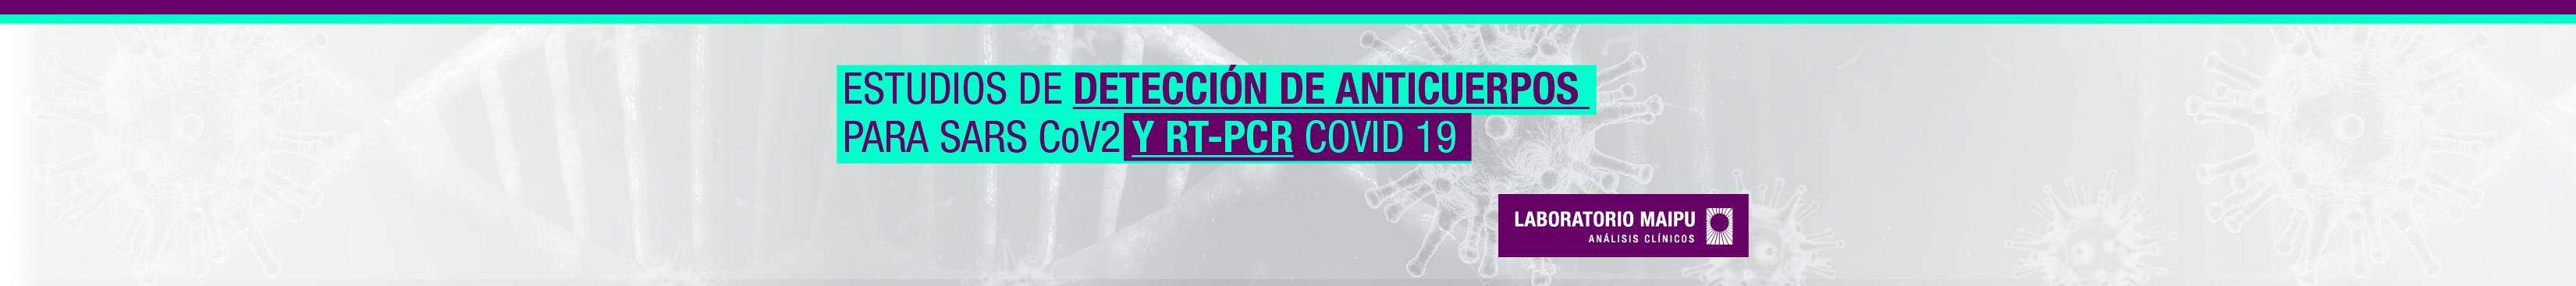 Banner_Web_Test_Anticuerpos_Coronavirus-09